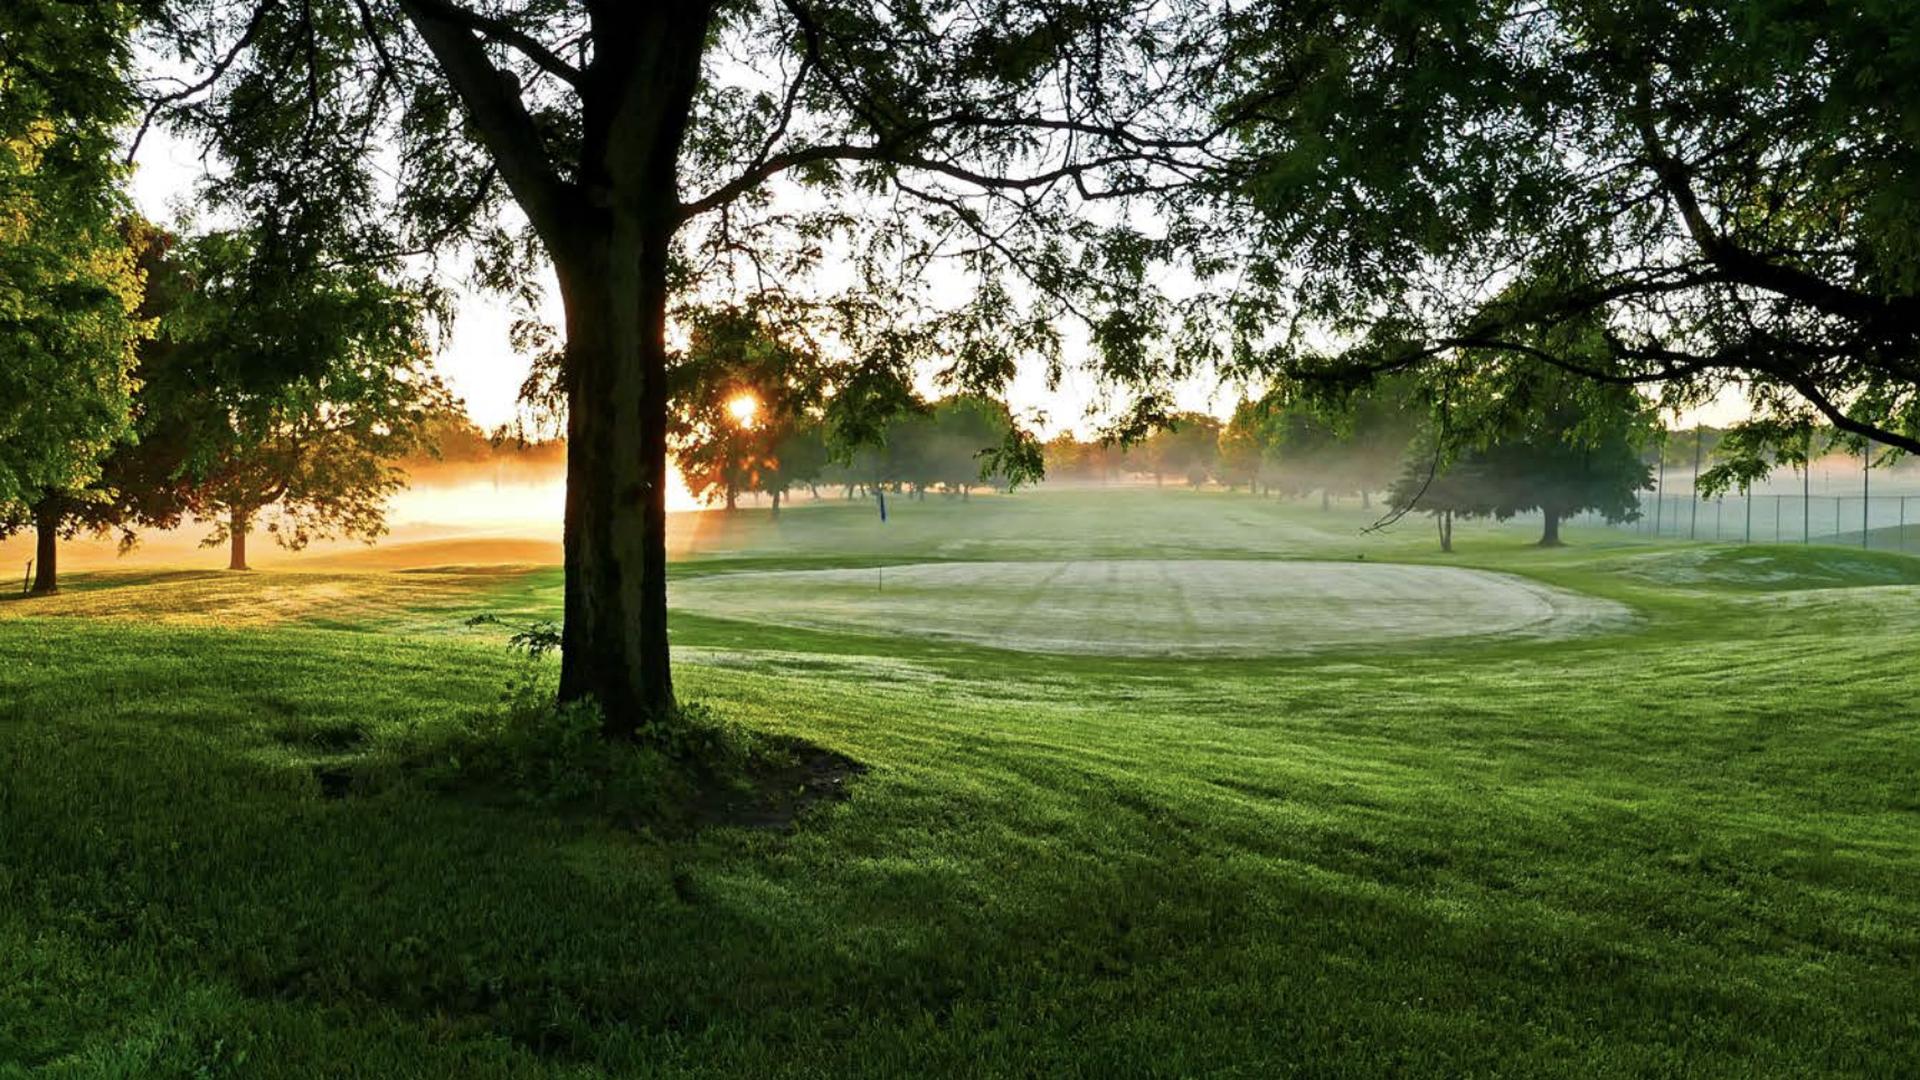 The green at Hiawatha Golf Course in South Minneapolis.